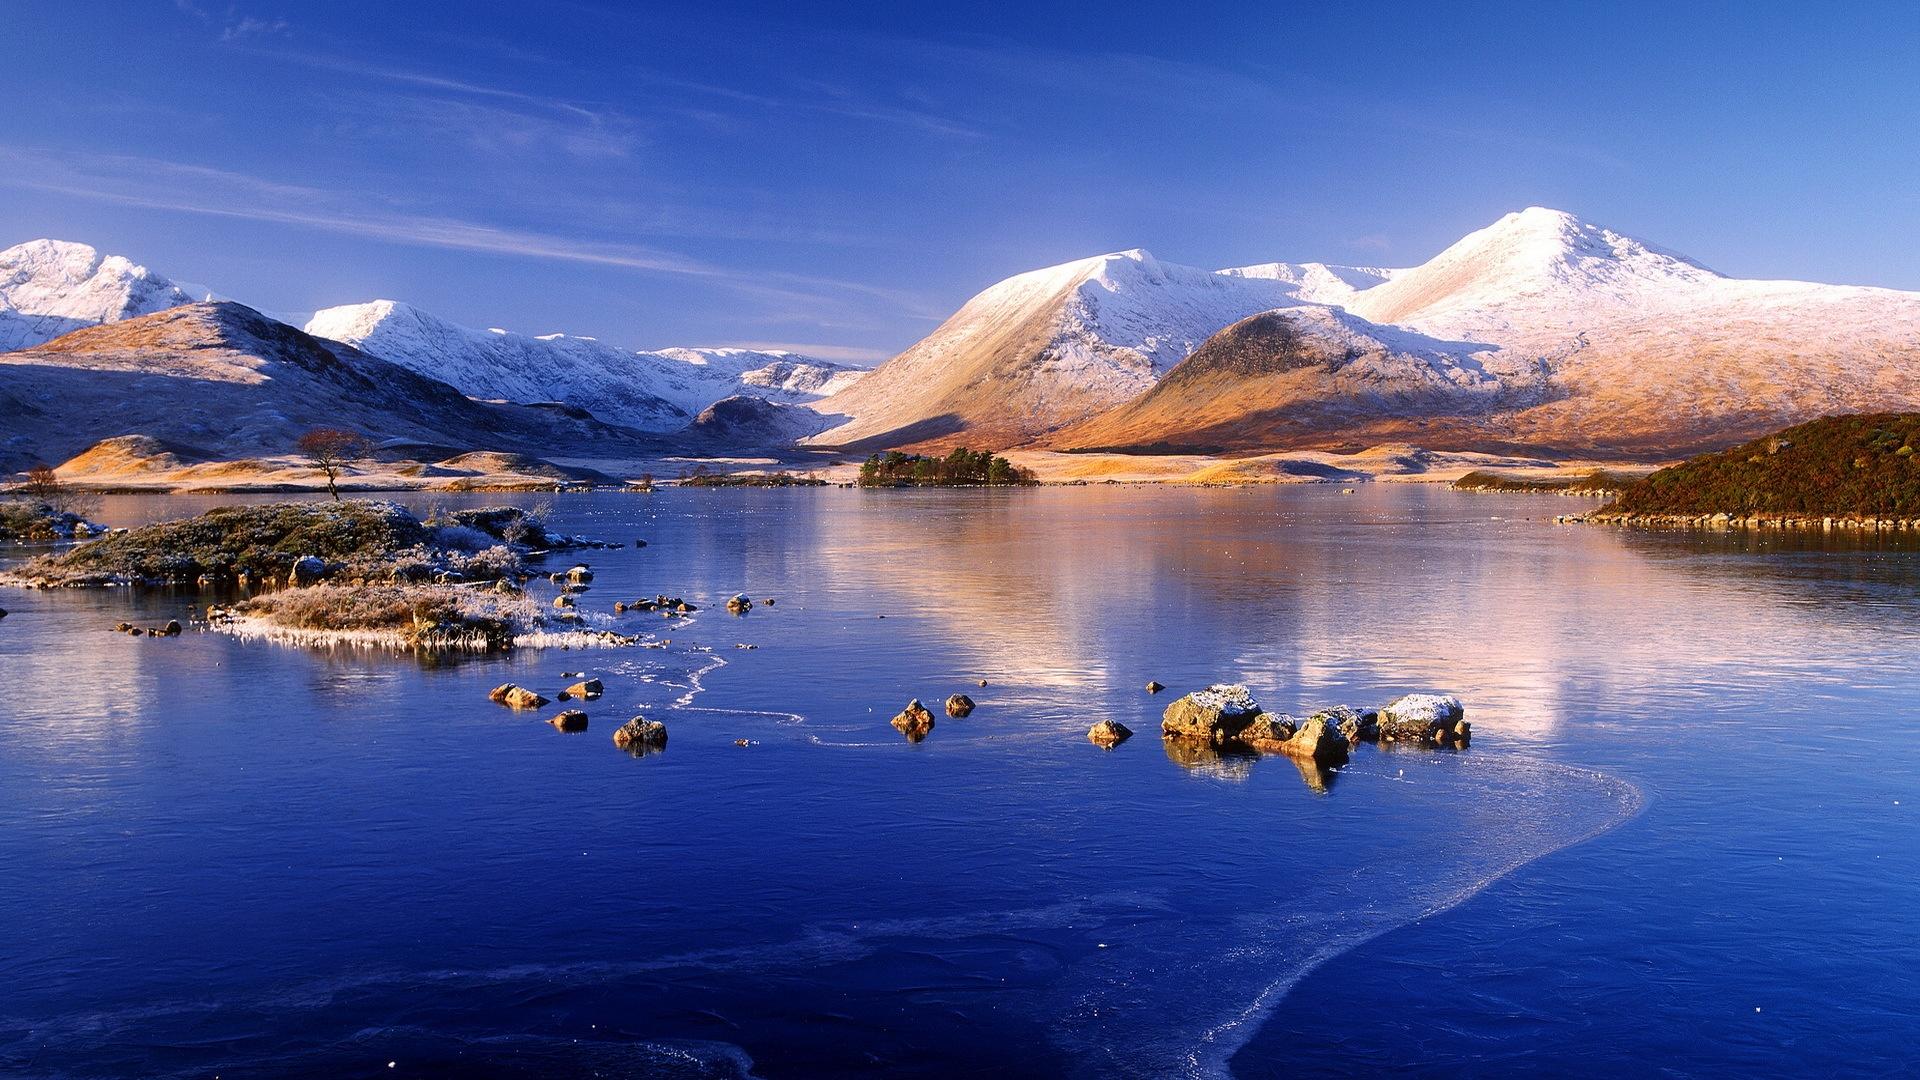 Wallpaper Winter Mountain Lake Snow Ice Blue Sky 1920x1080